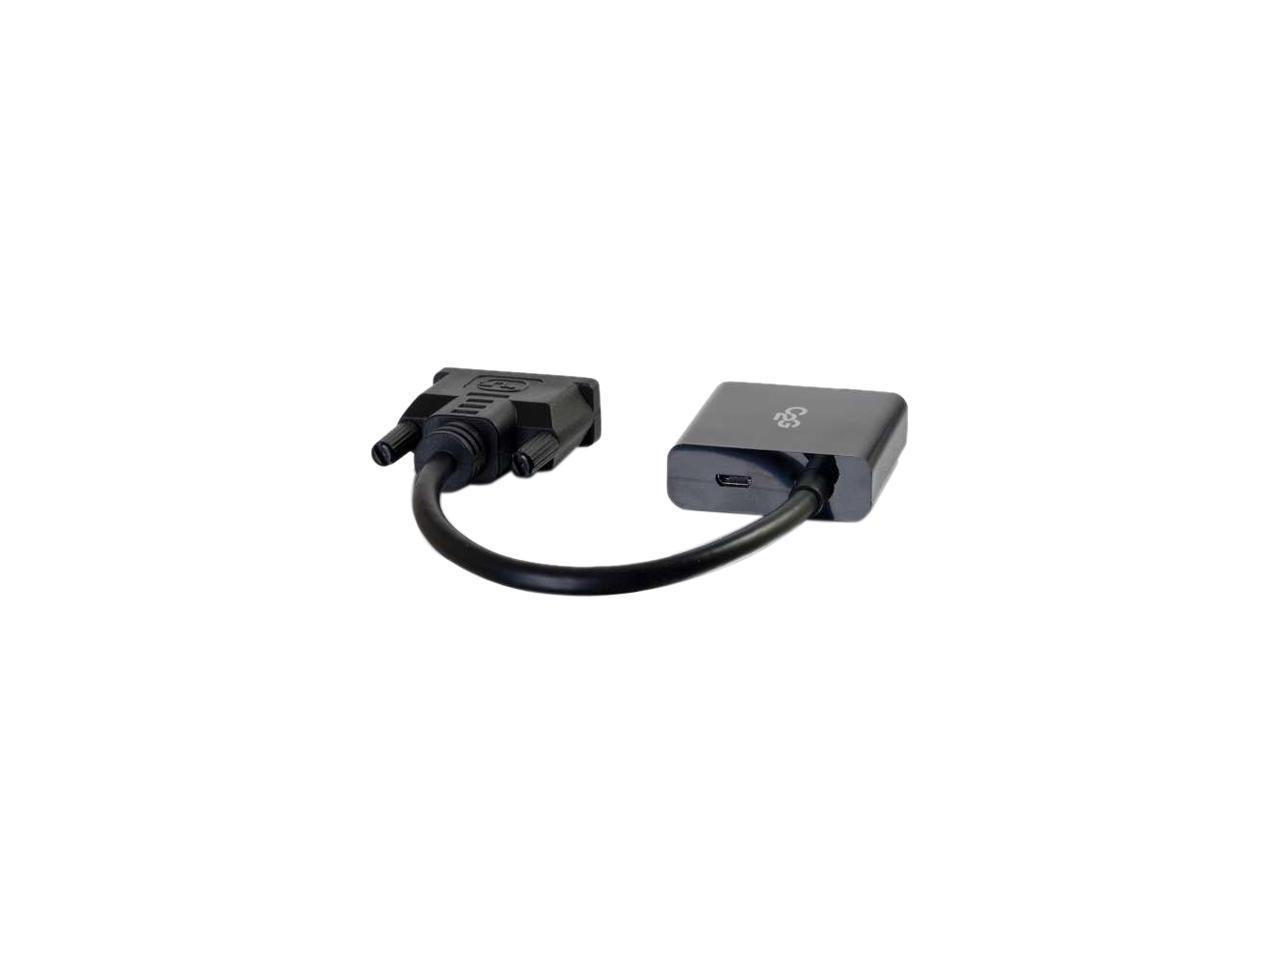 C2G 41380 DVI to VGA Adapter Converter Black